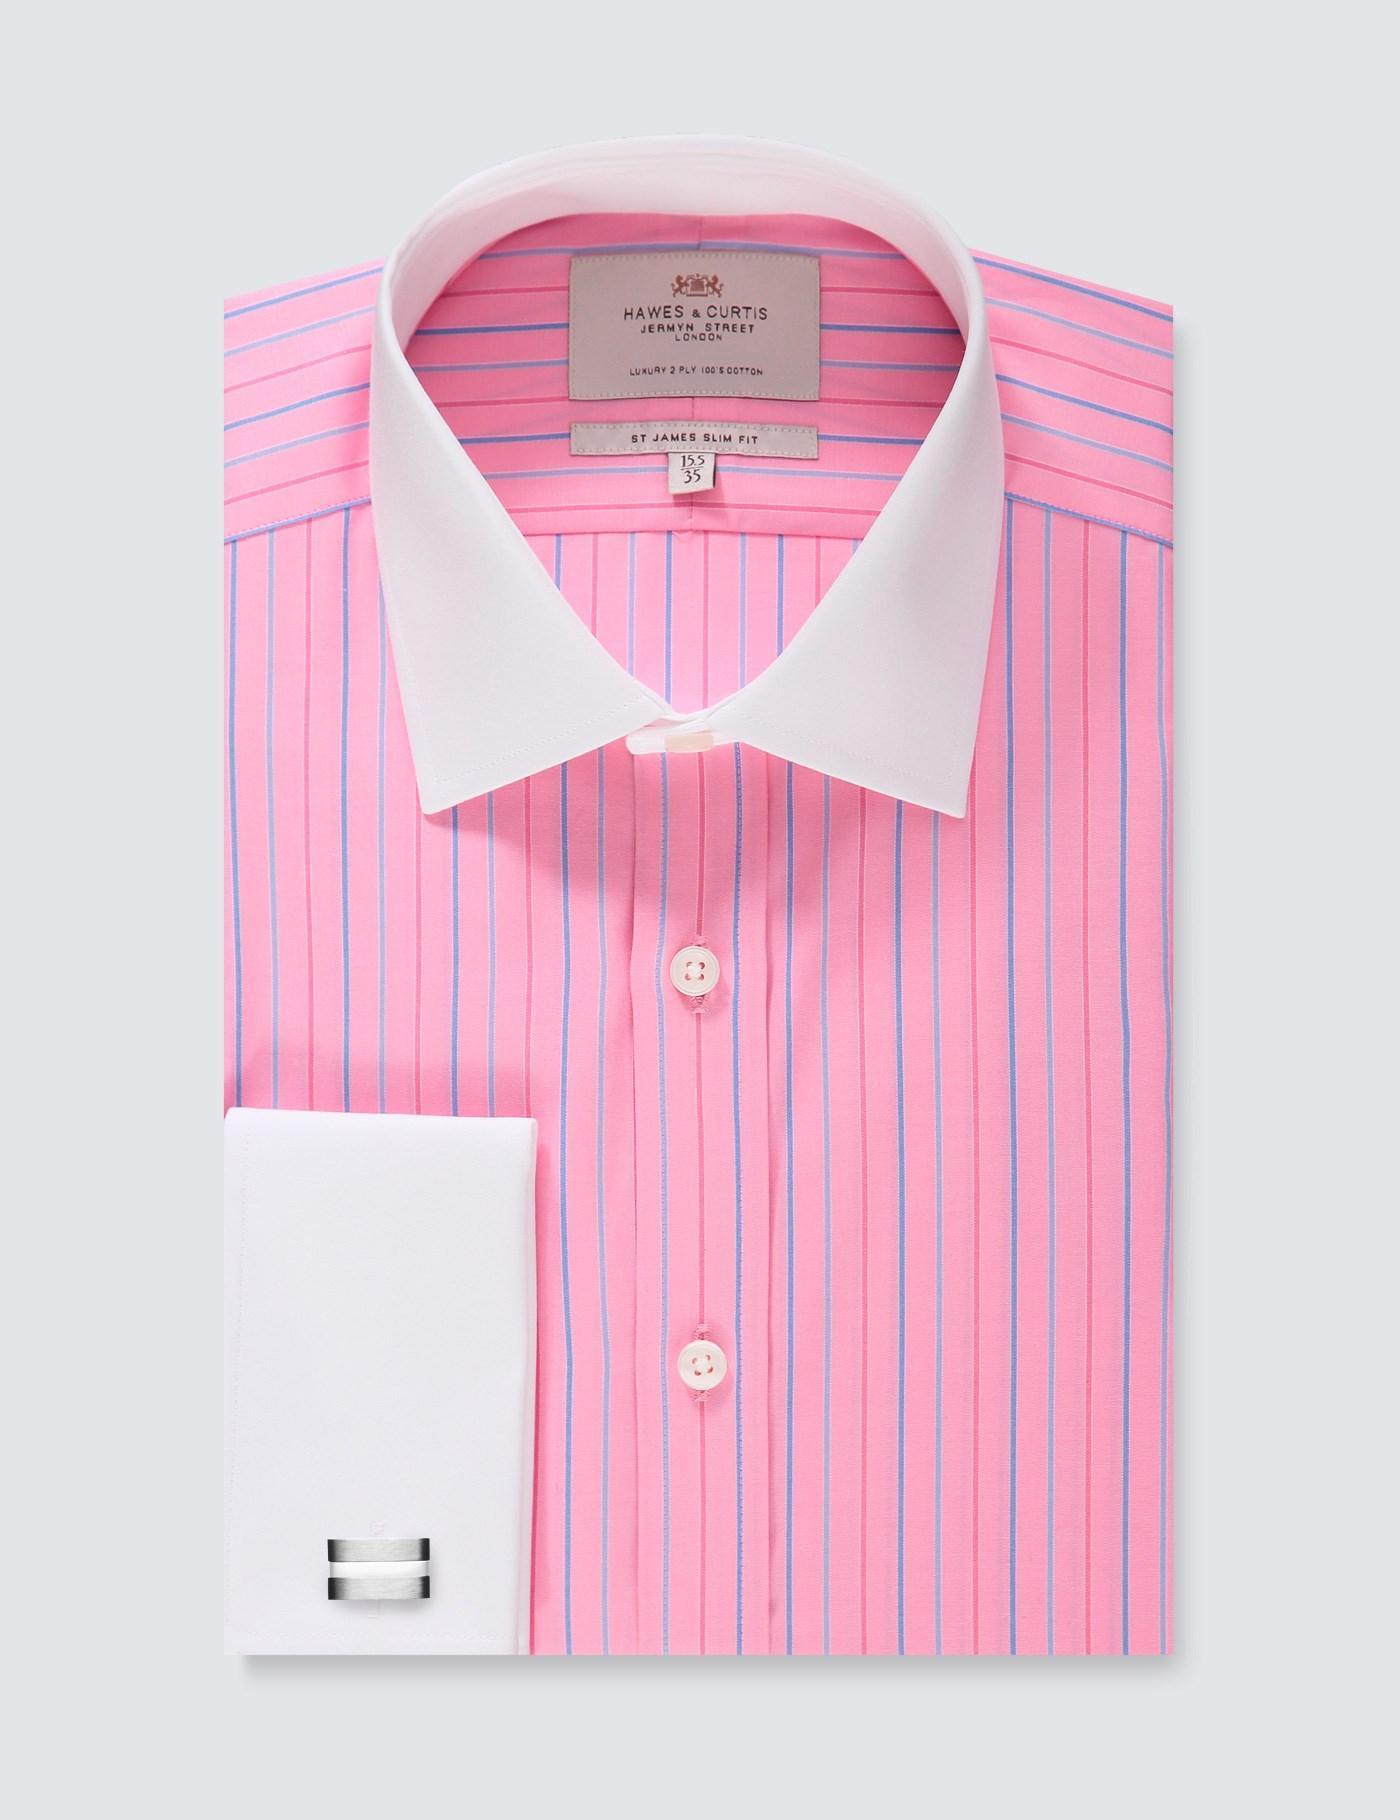 410a504c64 Lyst - Hawes & Curtis Pink & Blue Stripe Slim Fit Dress Shirt in Pink for  Men